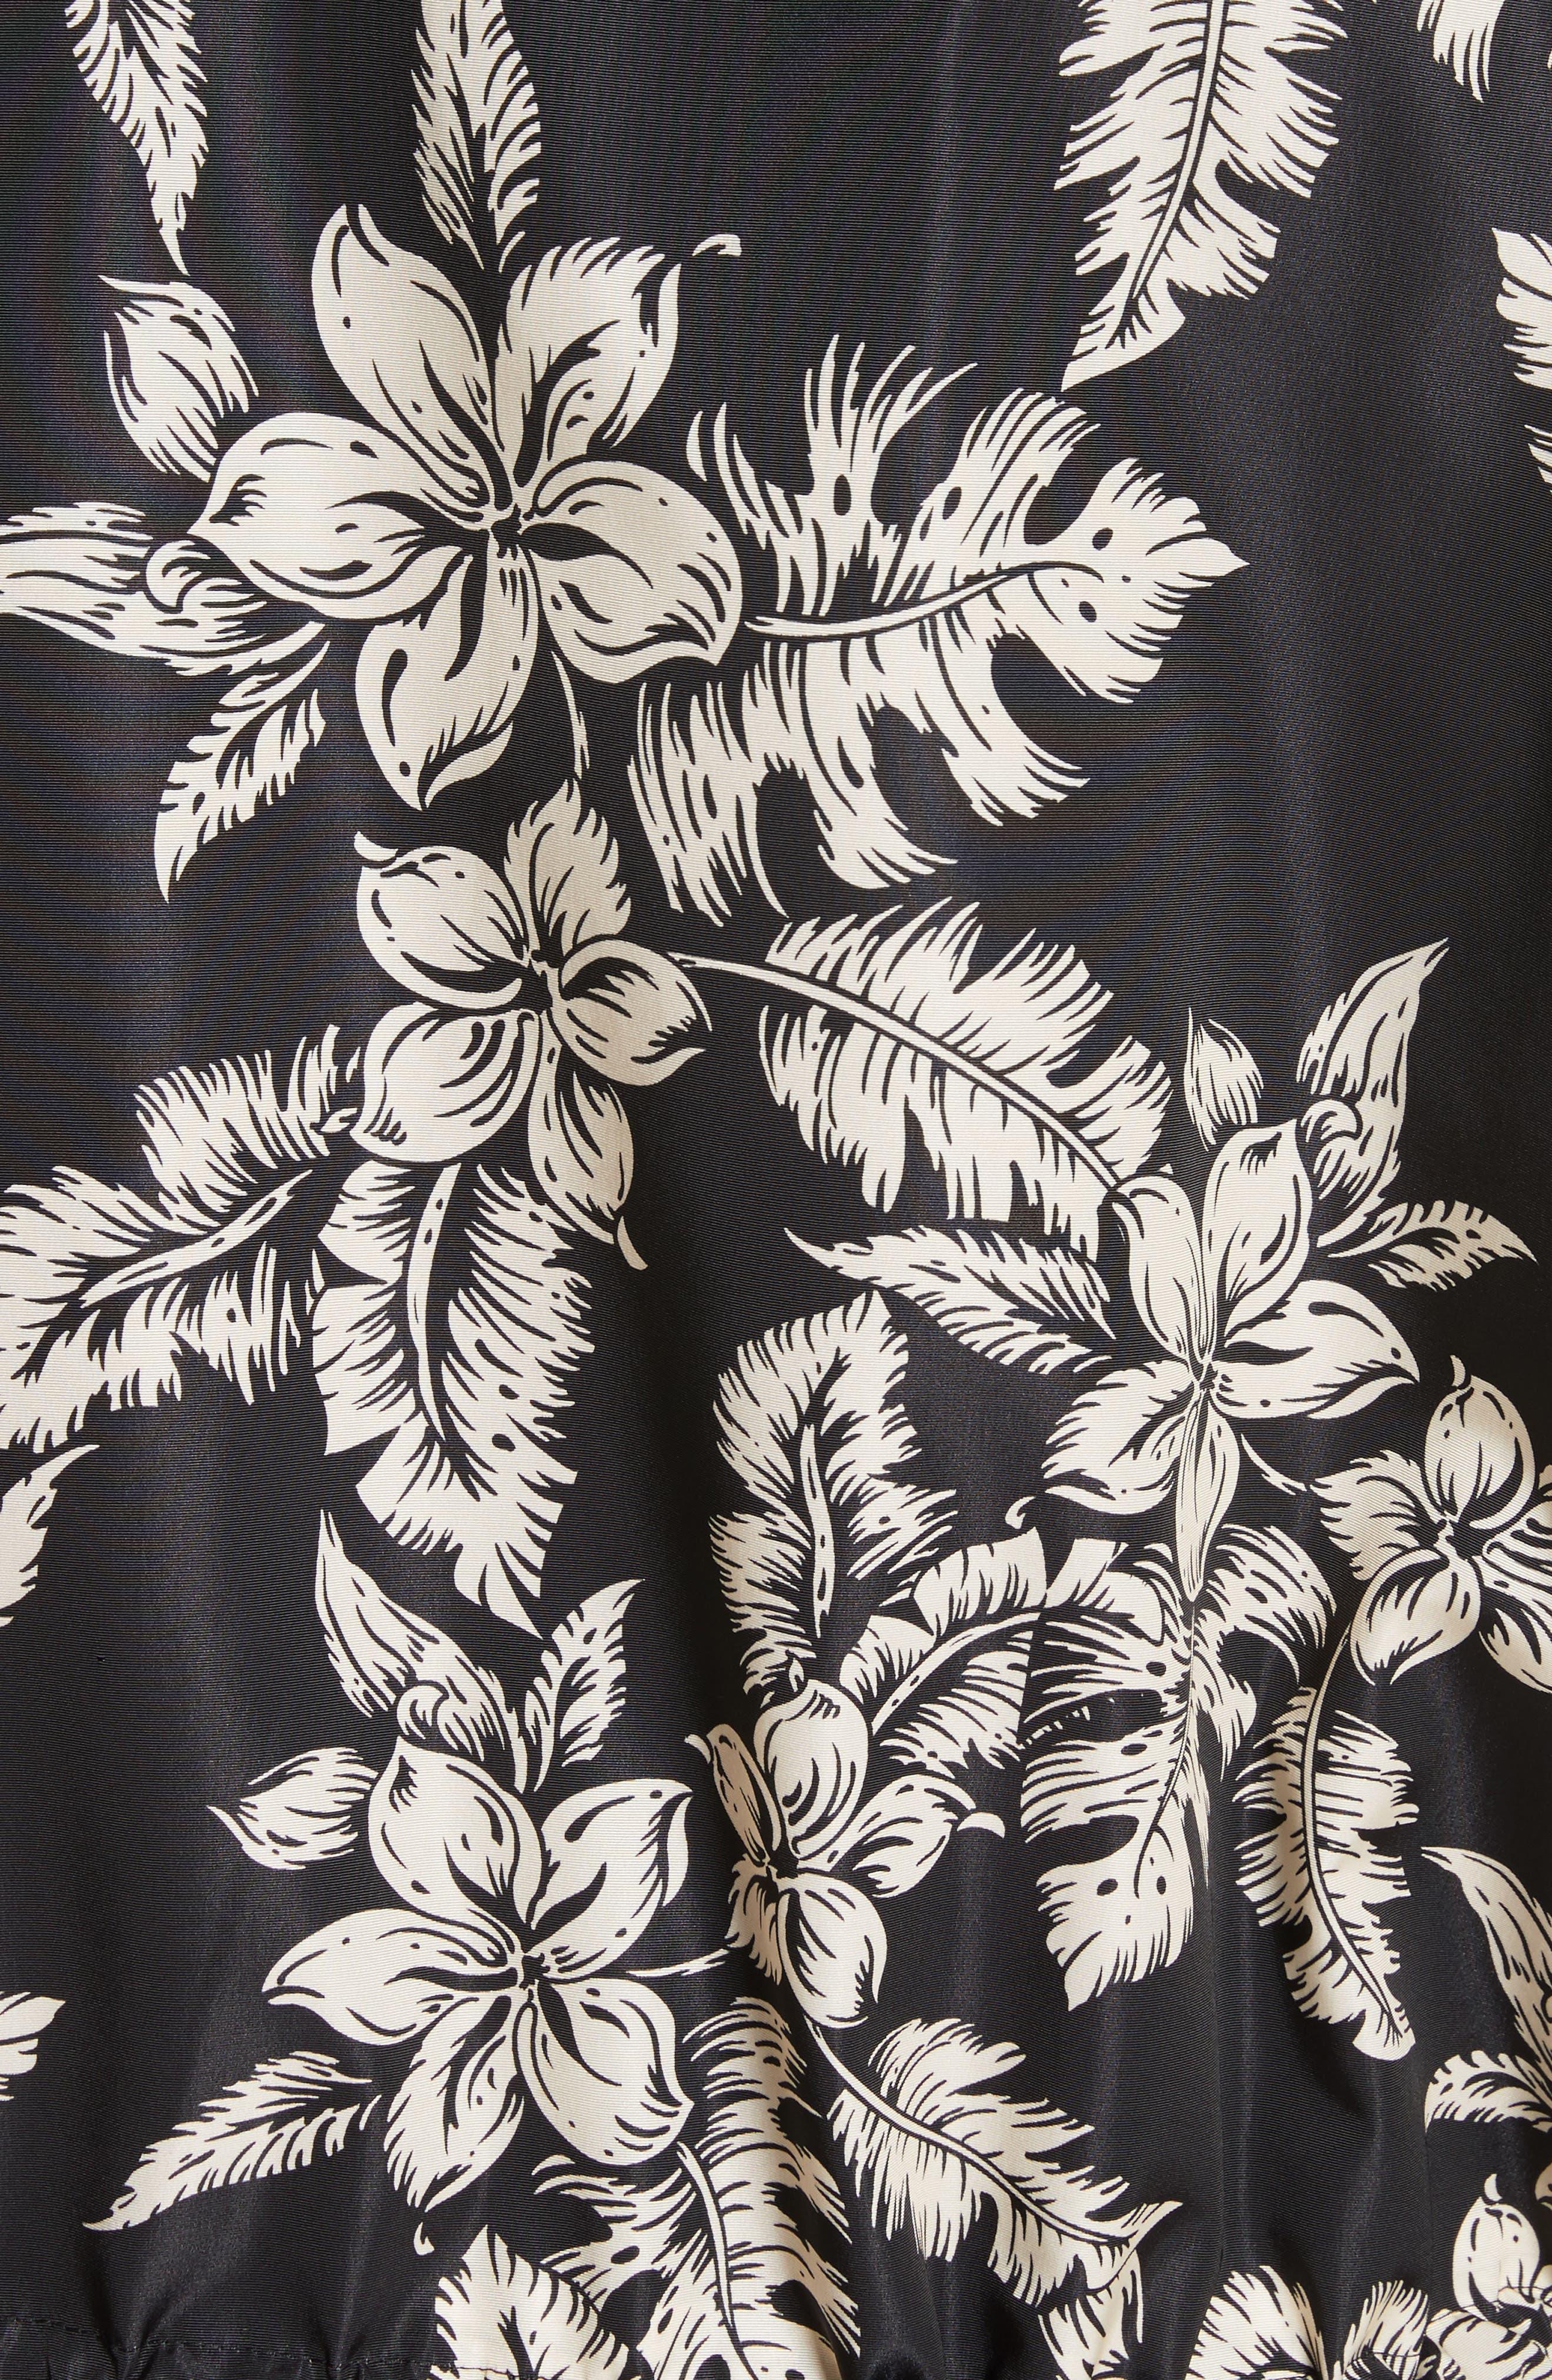 Water Resistant Floral Print Hooded Jacket,                             Alternate thumbnail 6, color,                             001